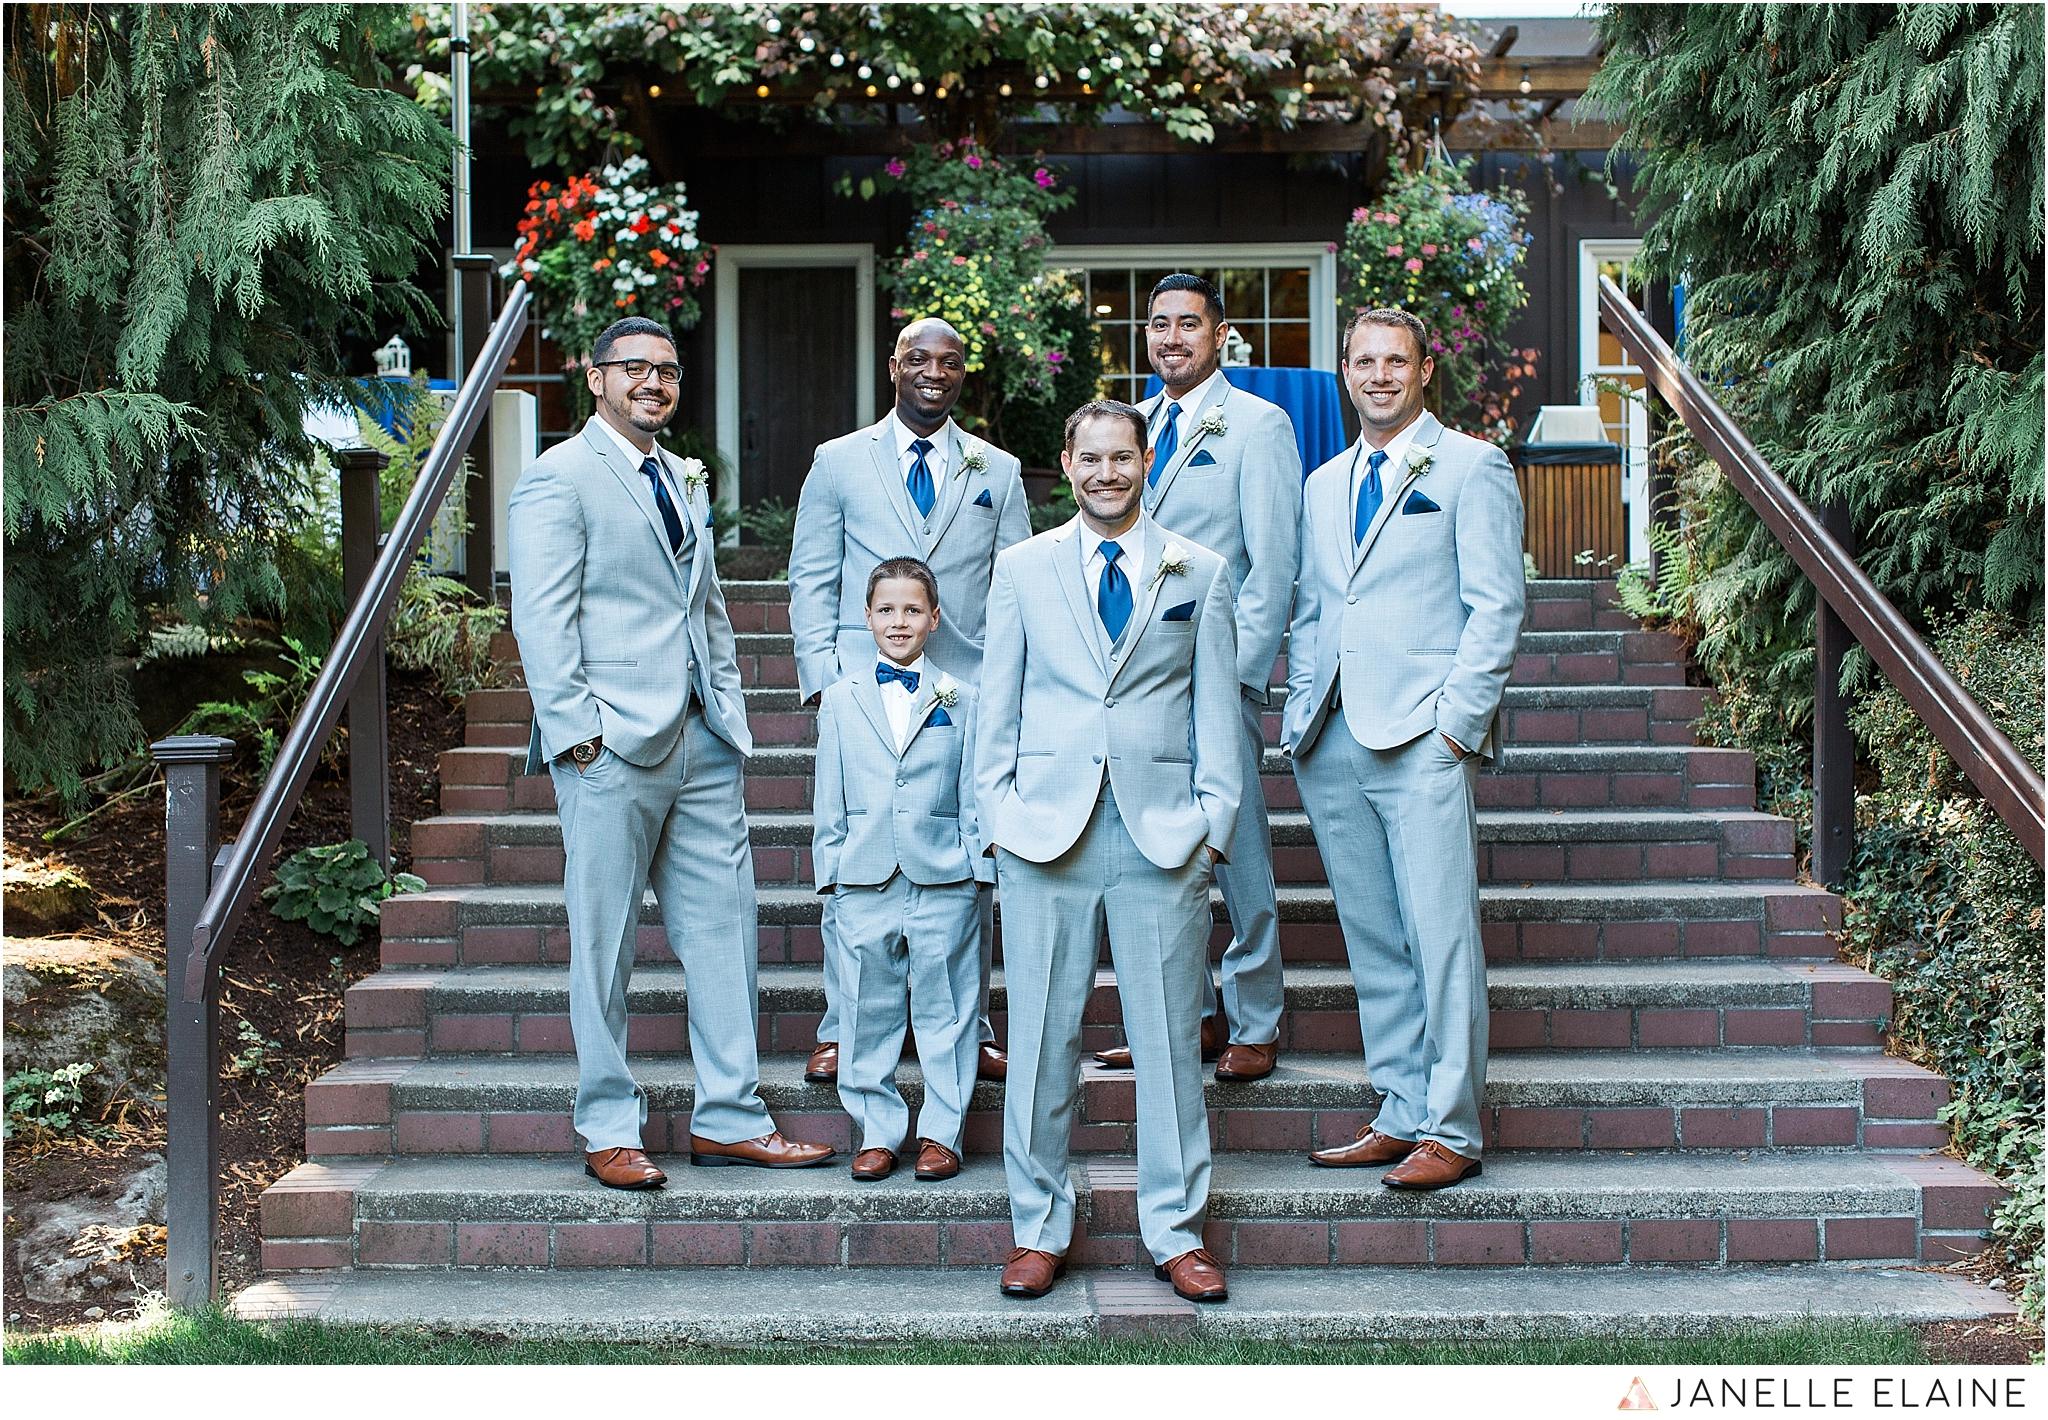 janelle elaine photography-professional wedding photographer-seattle-bellevue-robinswood house-87.jpg